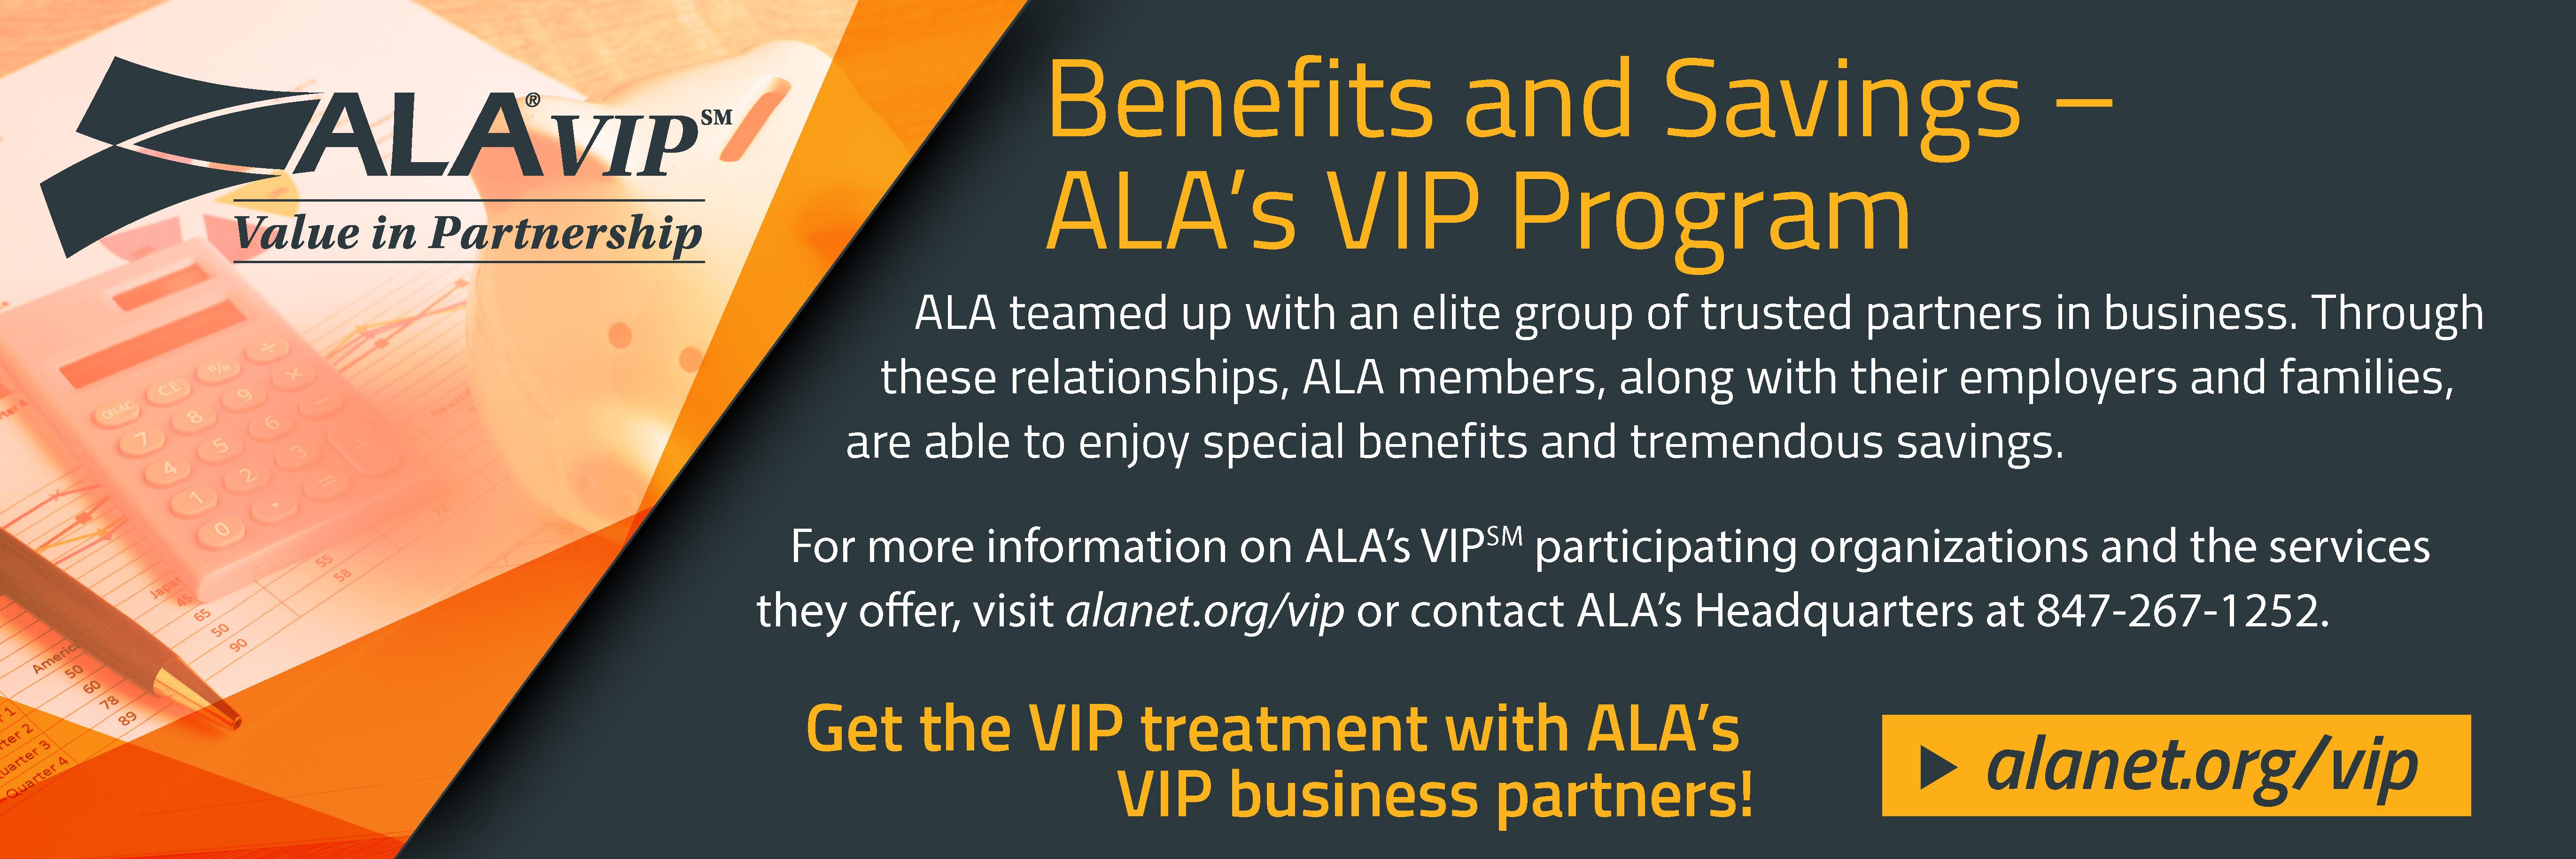 ALA ViP Program